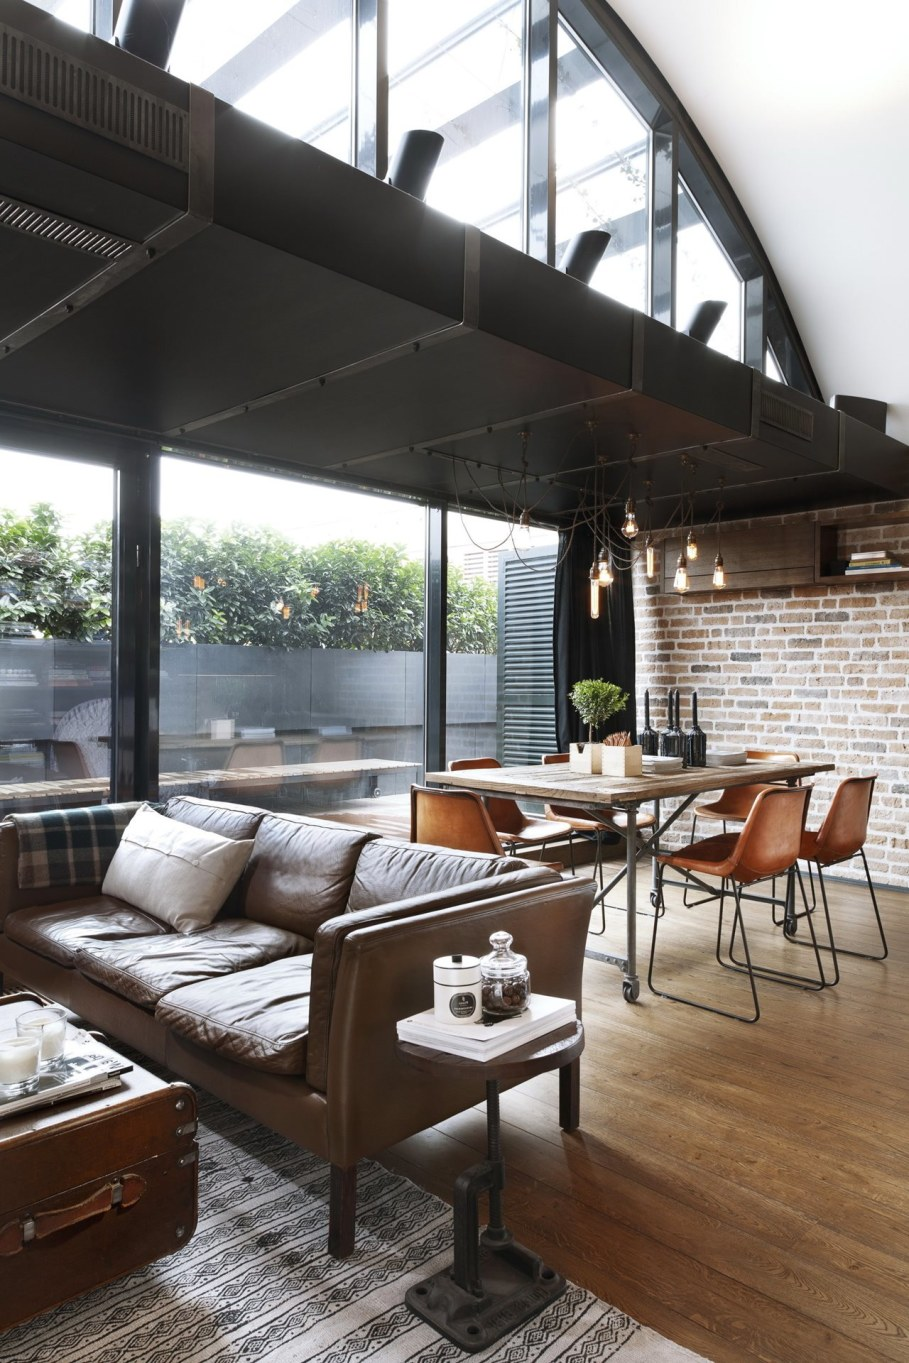 Designer`s Loft 9b In Sofia - Dining table